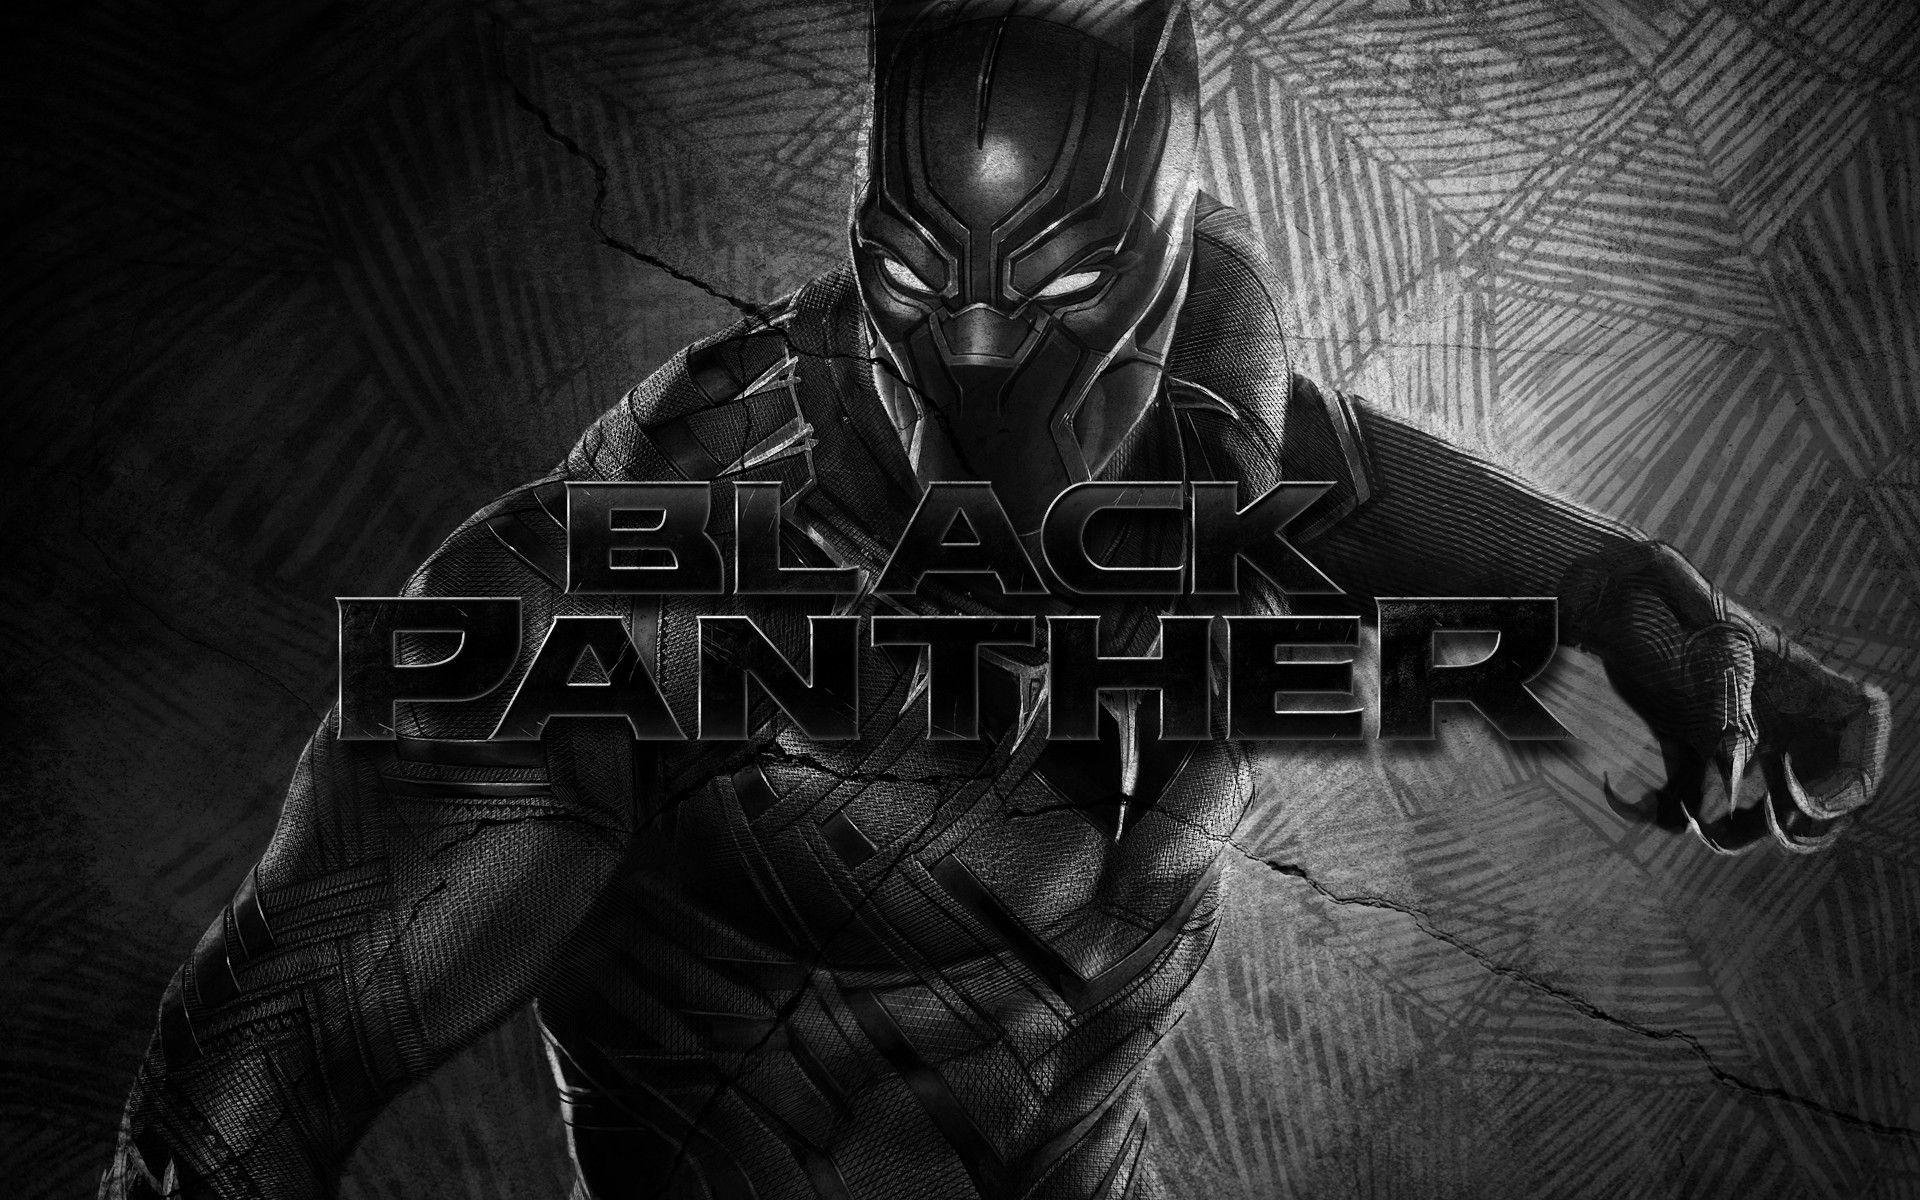 black panther hd wallpaper   epic car wallpapers   pinterest   black